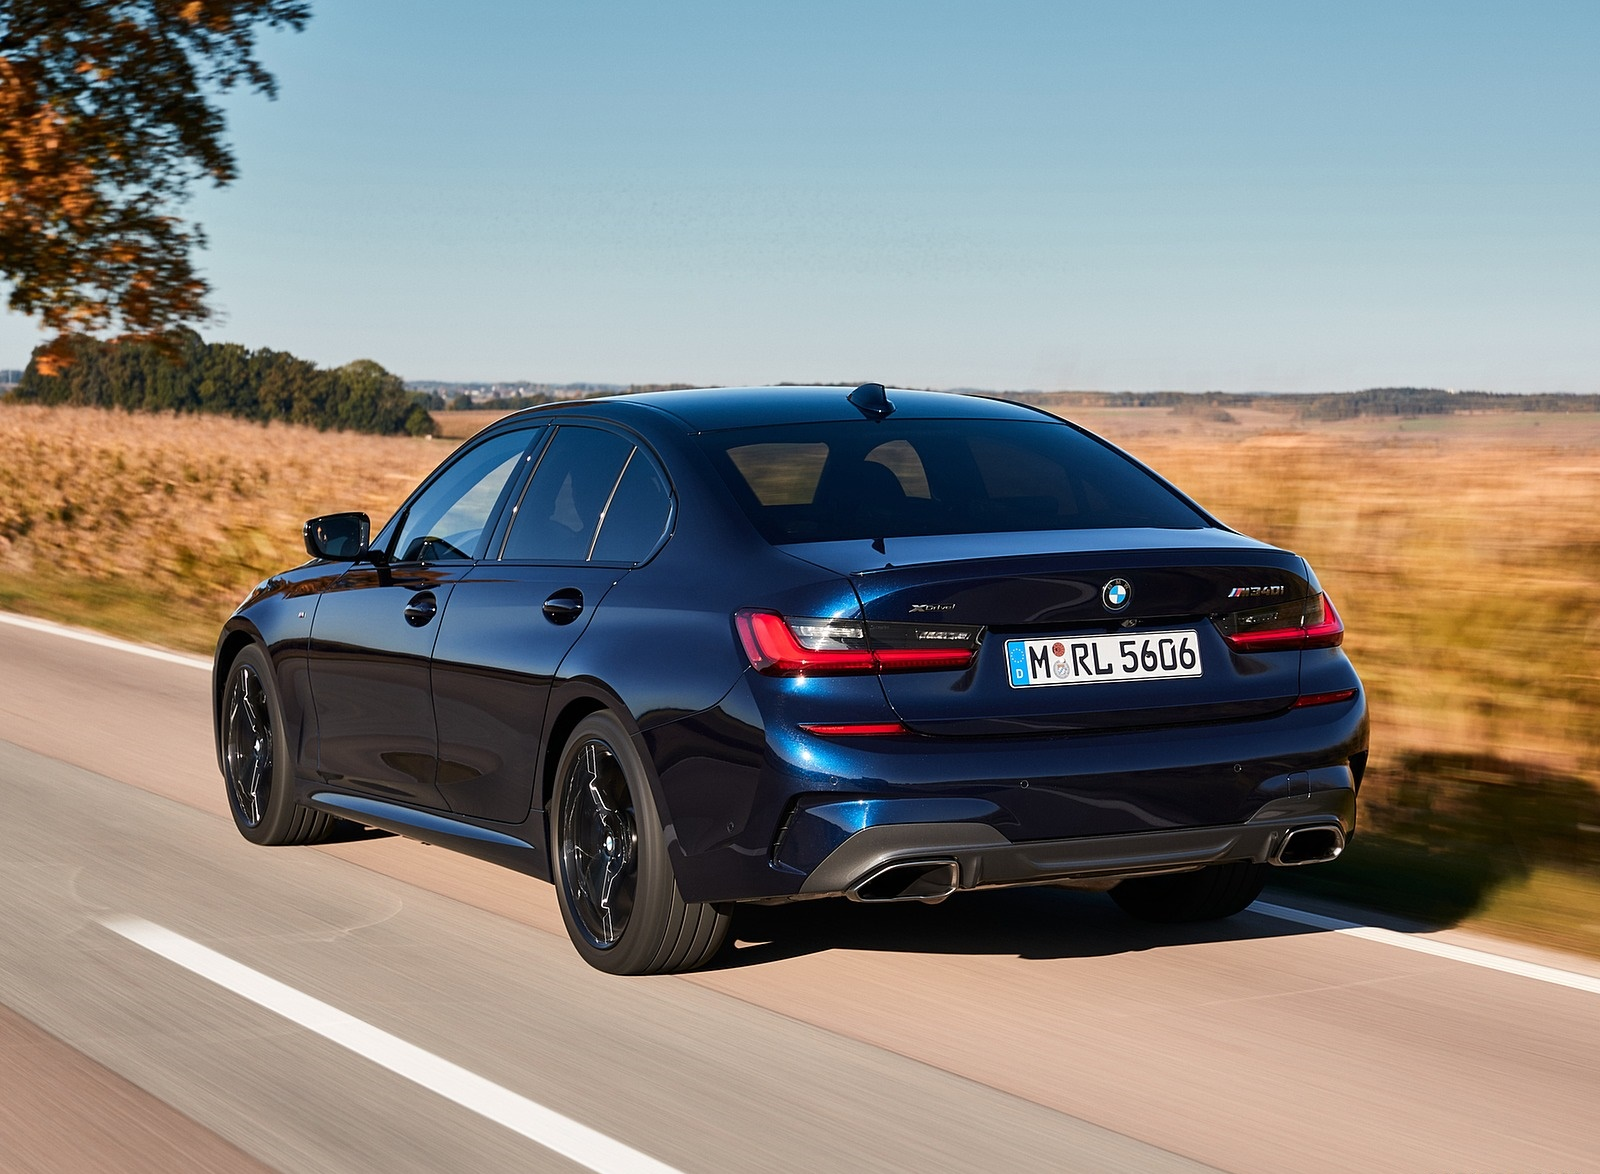 2020 BMW M340i Sedan (Color: Tanzanite Blue Metallic) Rear Three-Quarter Wallpapers #11 of 74